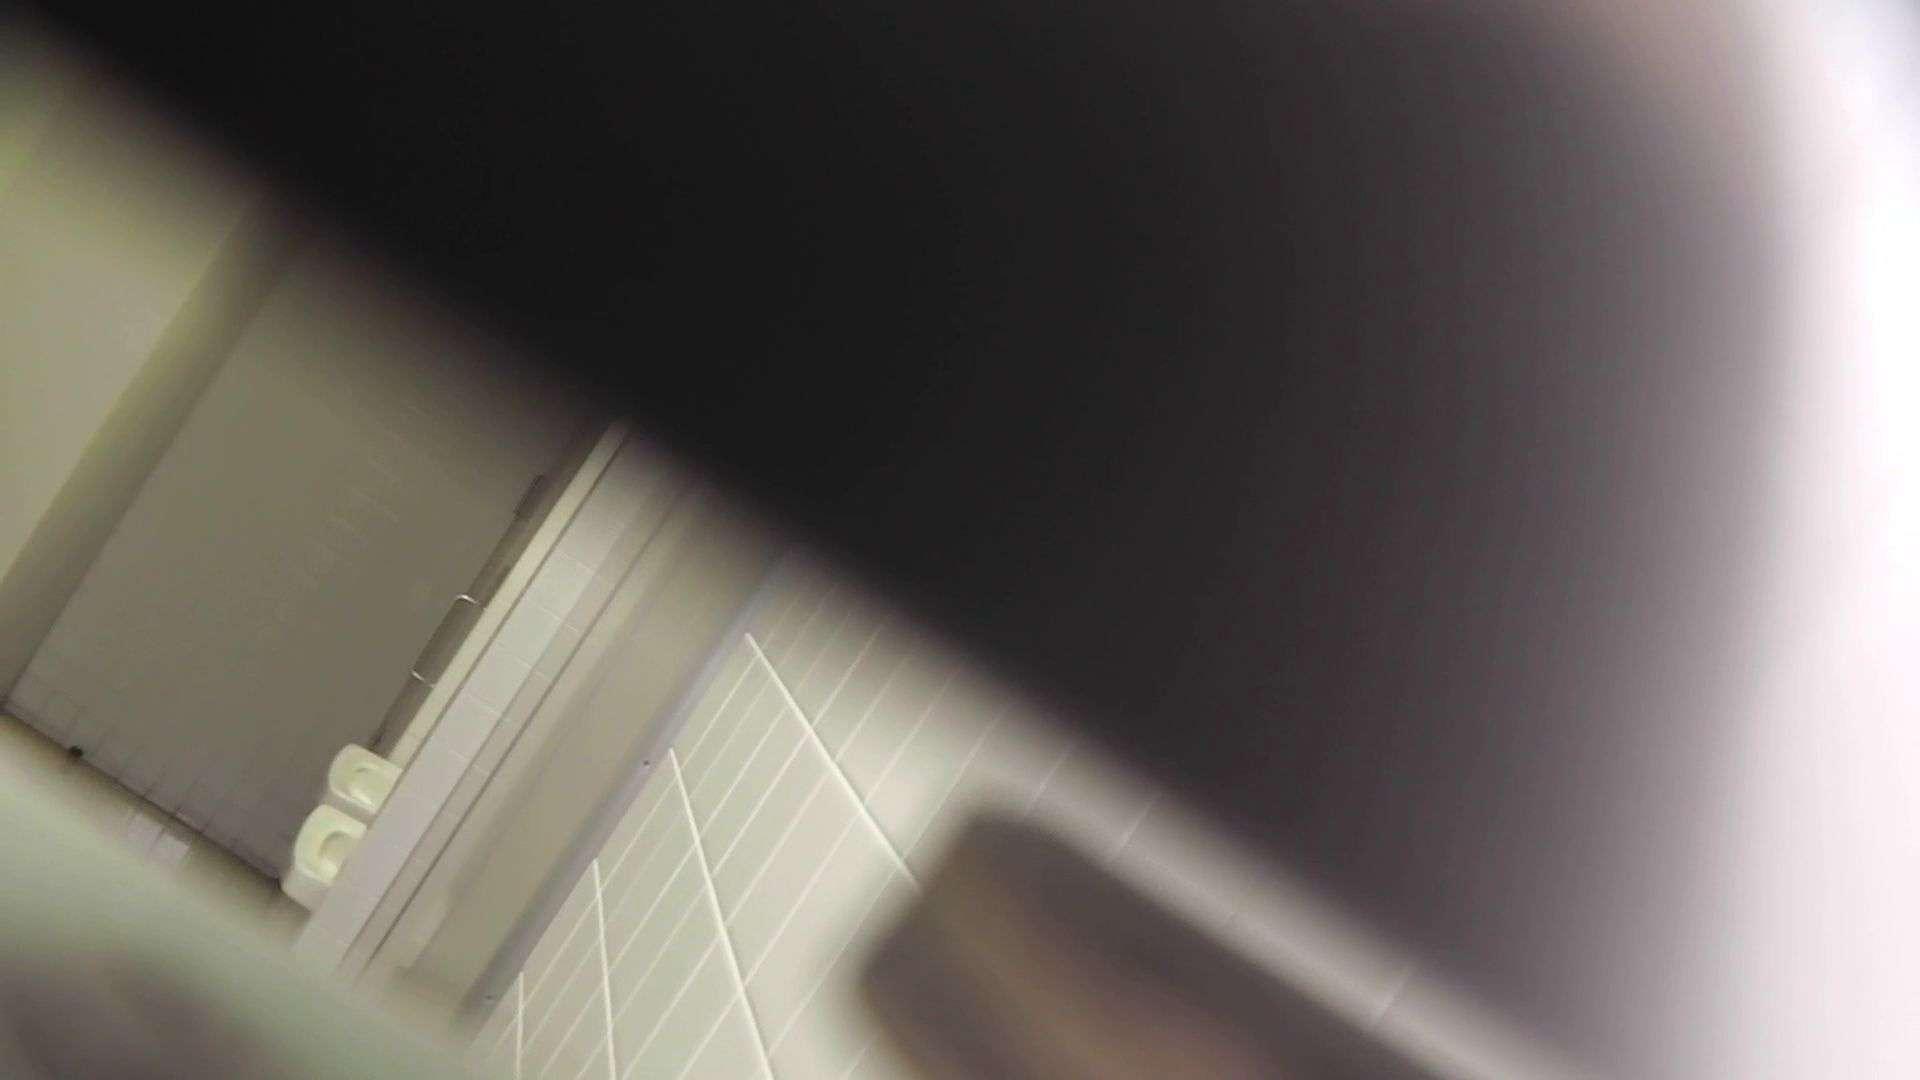 vol.27 命がけ潜伏洗面所! 小嶋陽菜似のピンクオシャレさん エロい美人 おめこ無修正動画無料 97枚